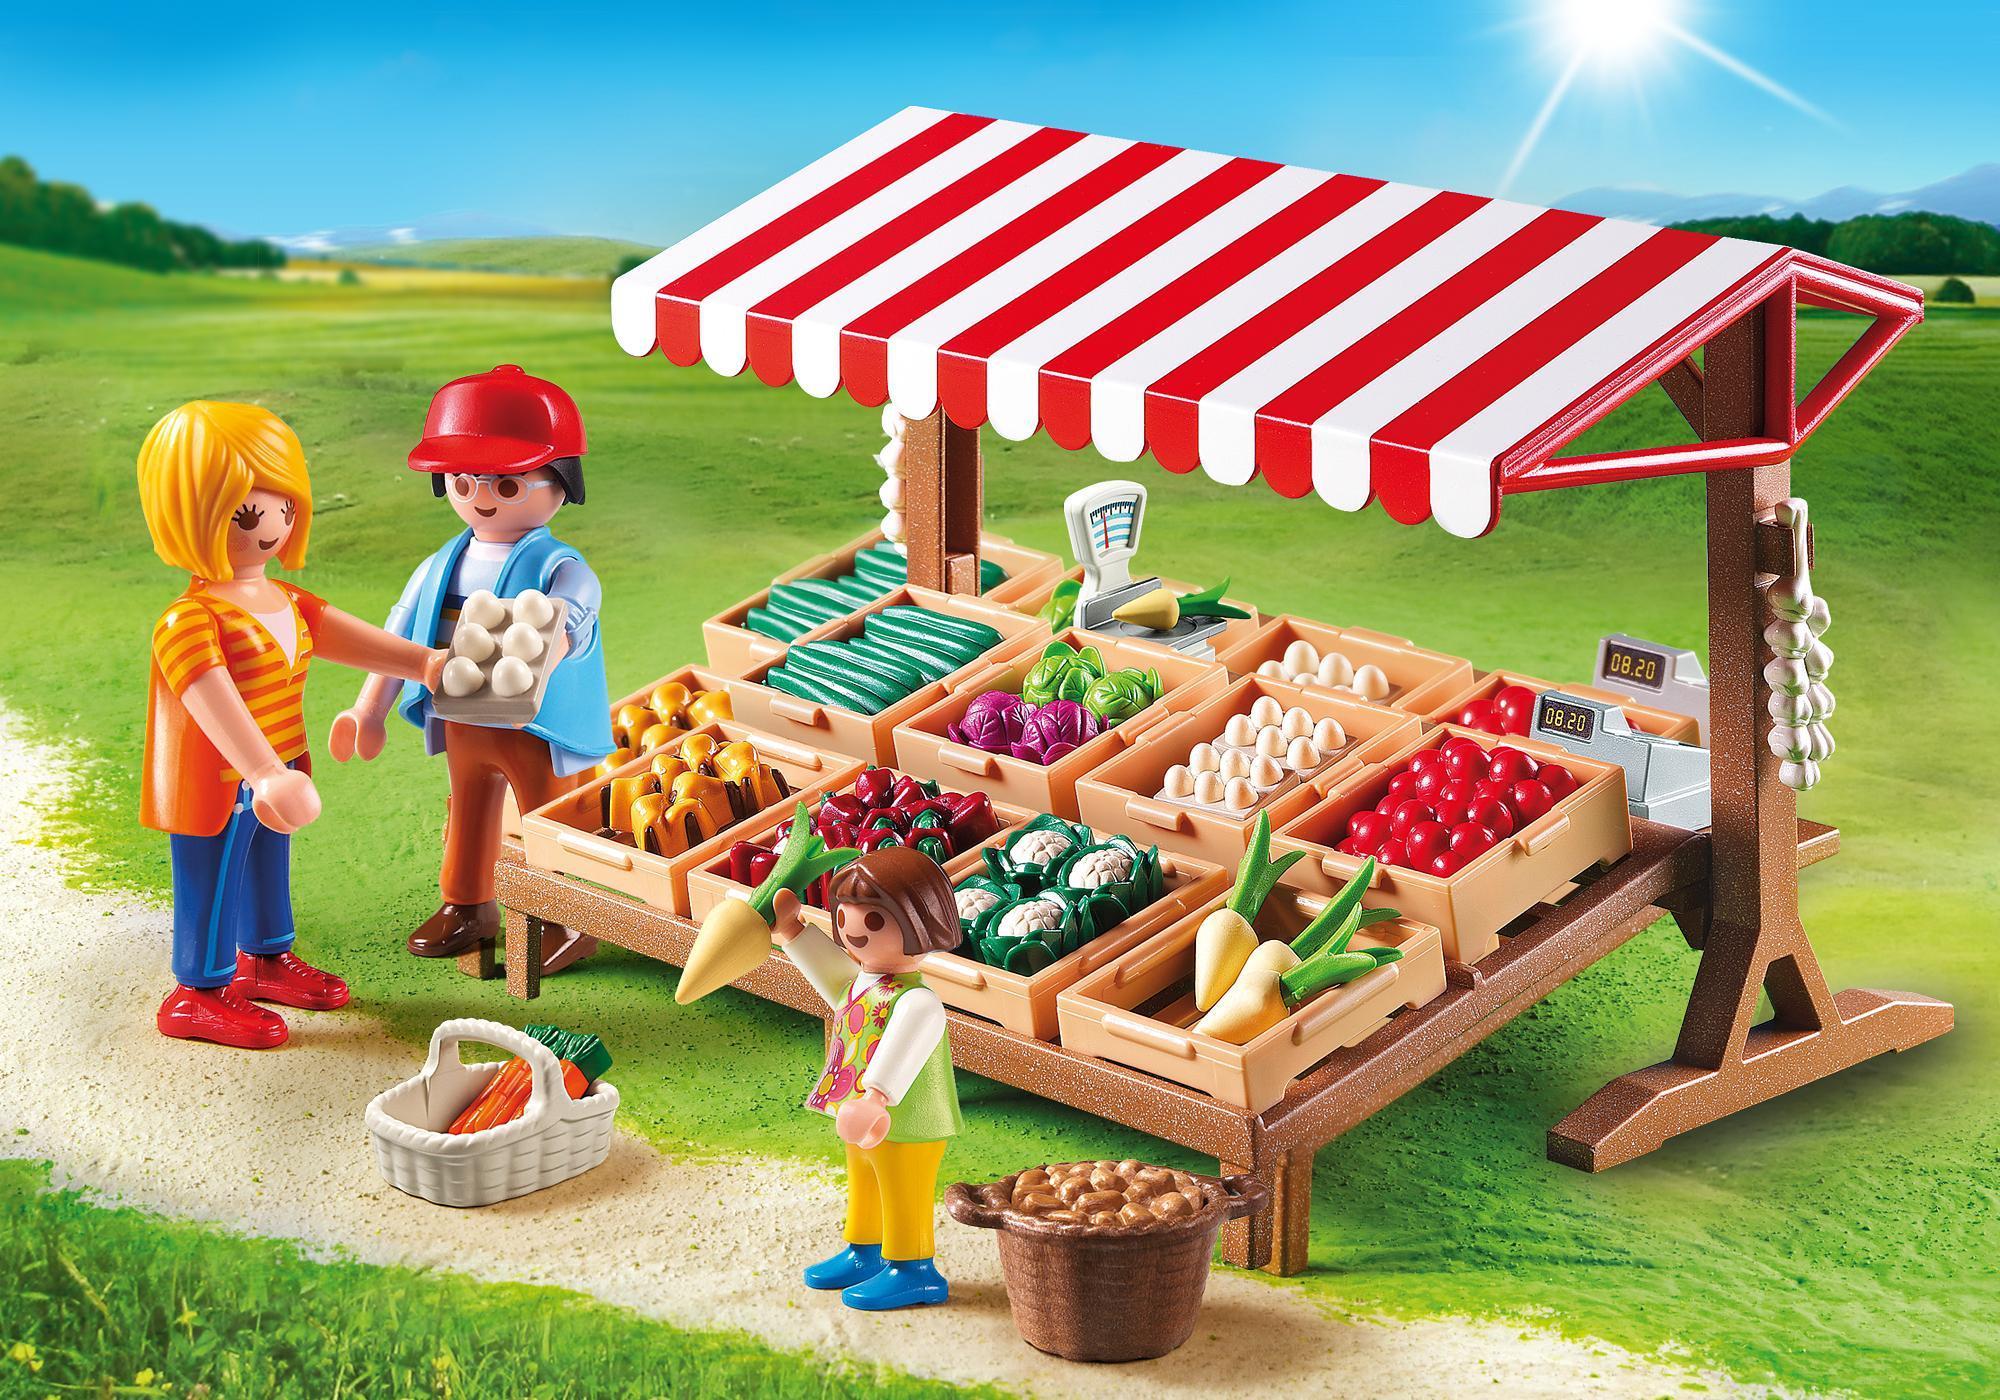 http://media.playmobil.com/i/playmobil/6121_product_detail/Gemüsestand